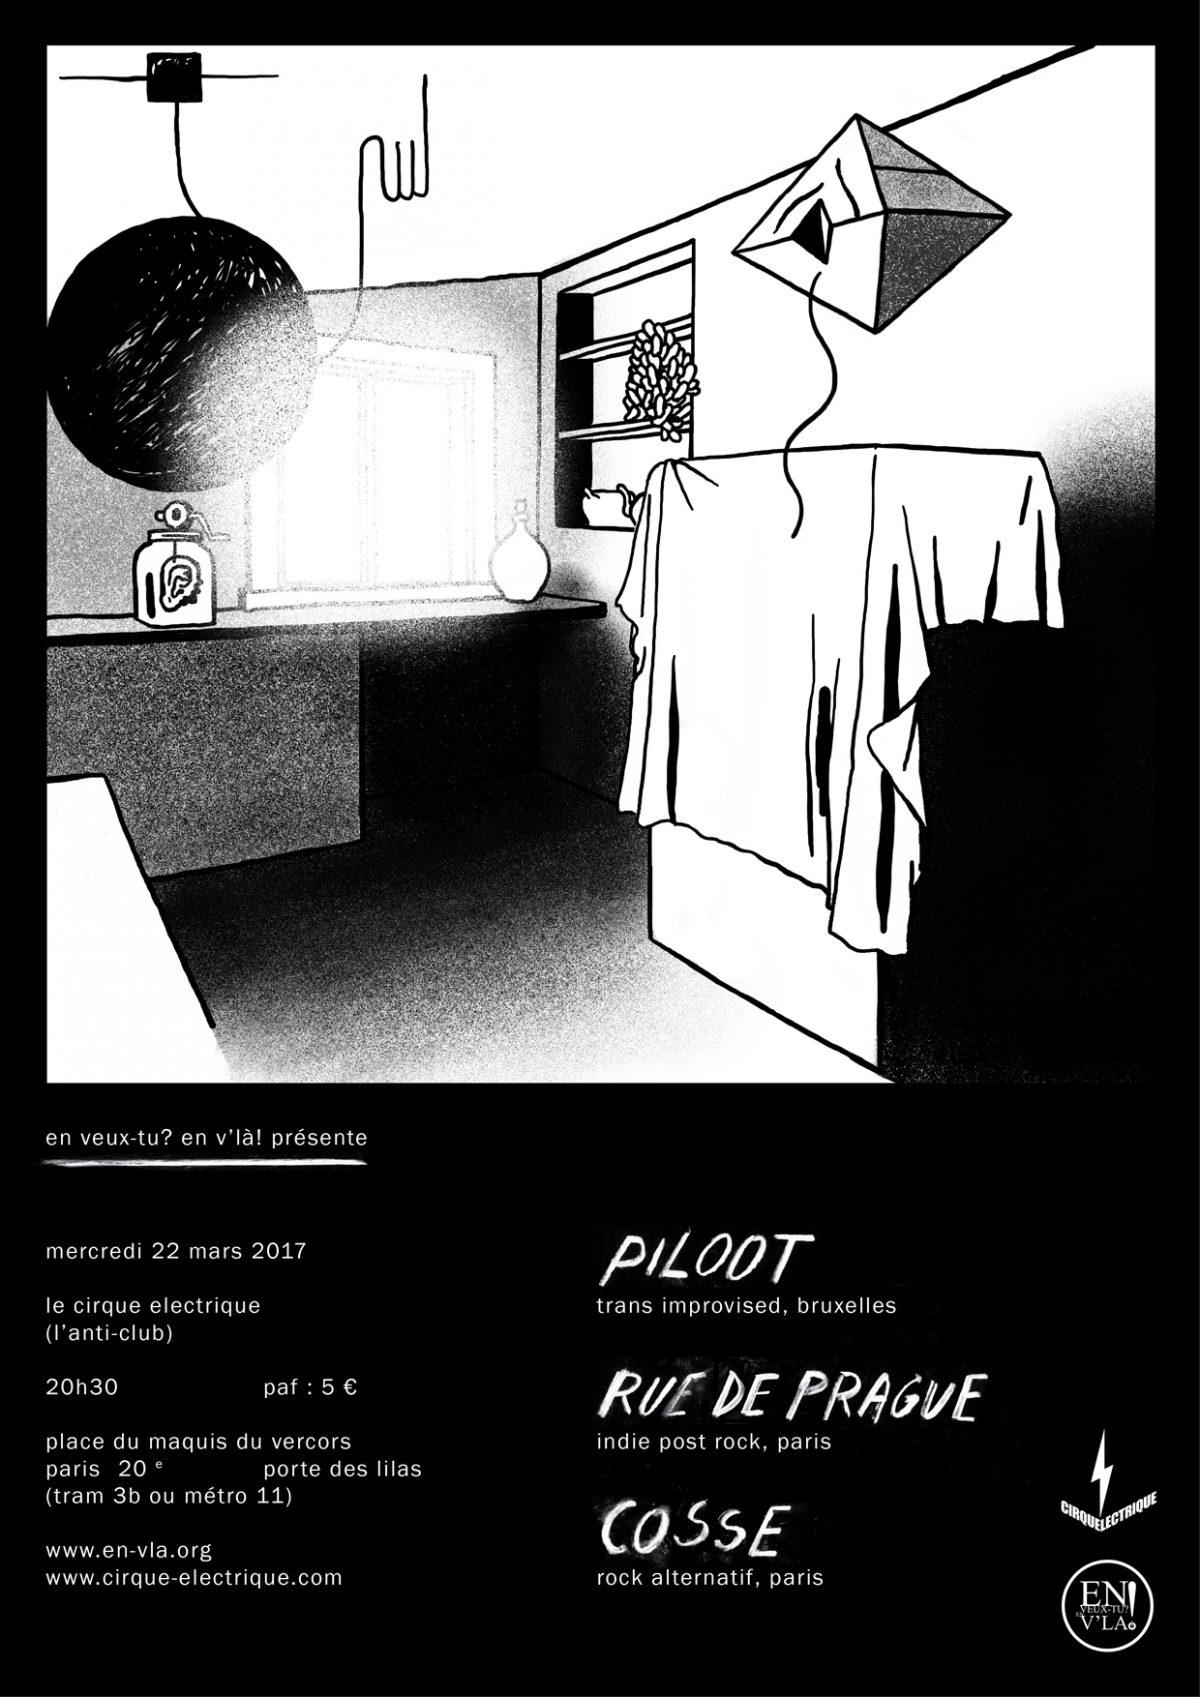 447 piloot rue de prague cosse le cirque - Le cirque electrique porte des lilas ...